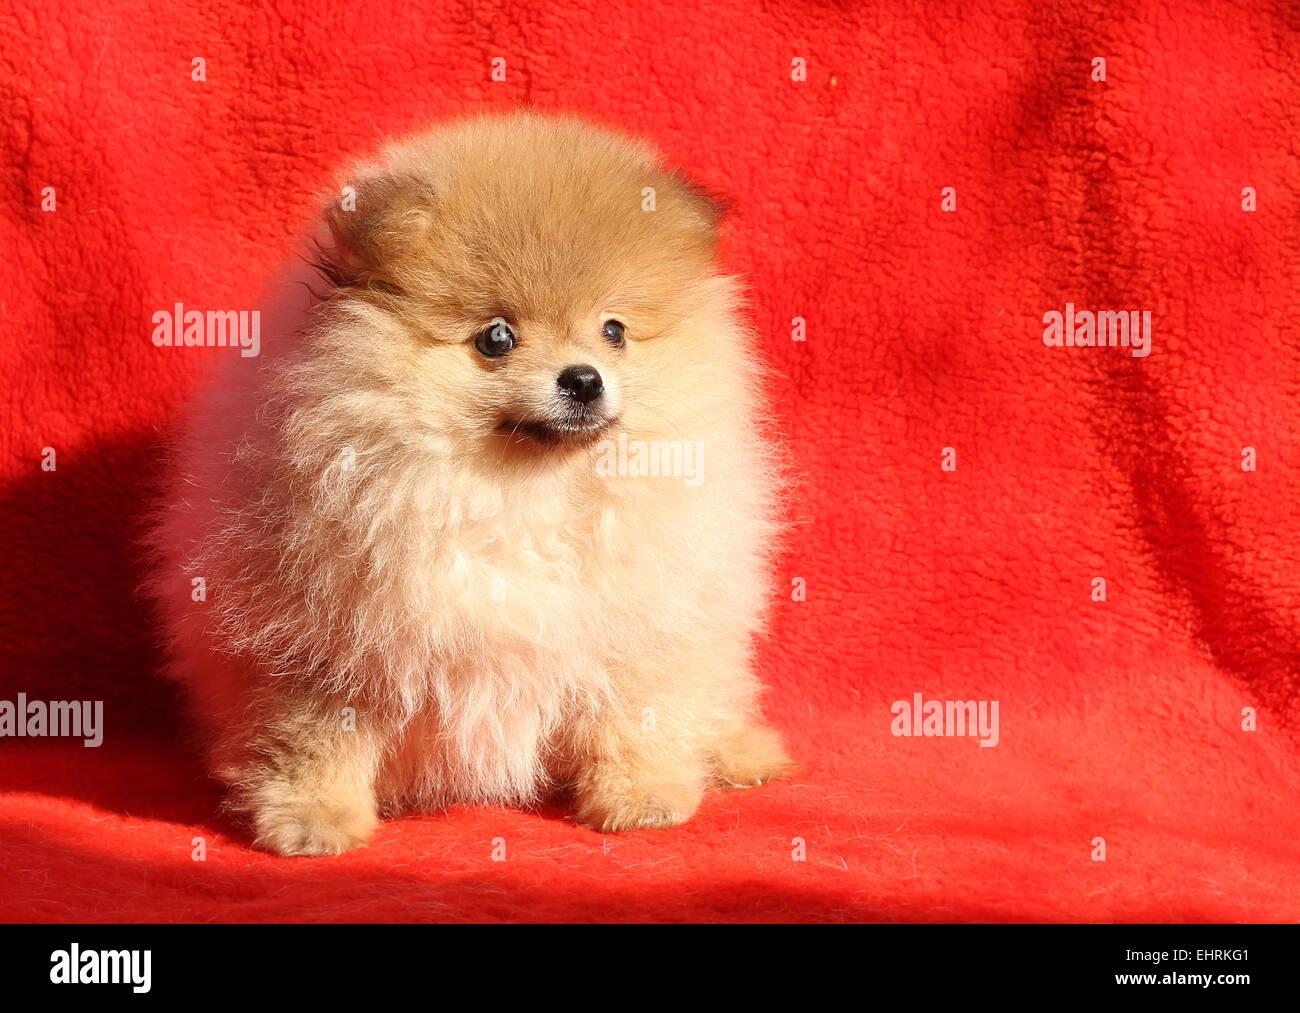 Pomeranian Dog Sitting On A Red Background Stock Photo 79810865 Alamy